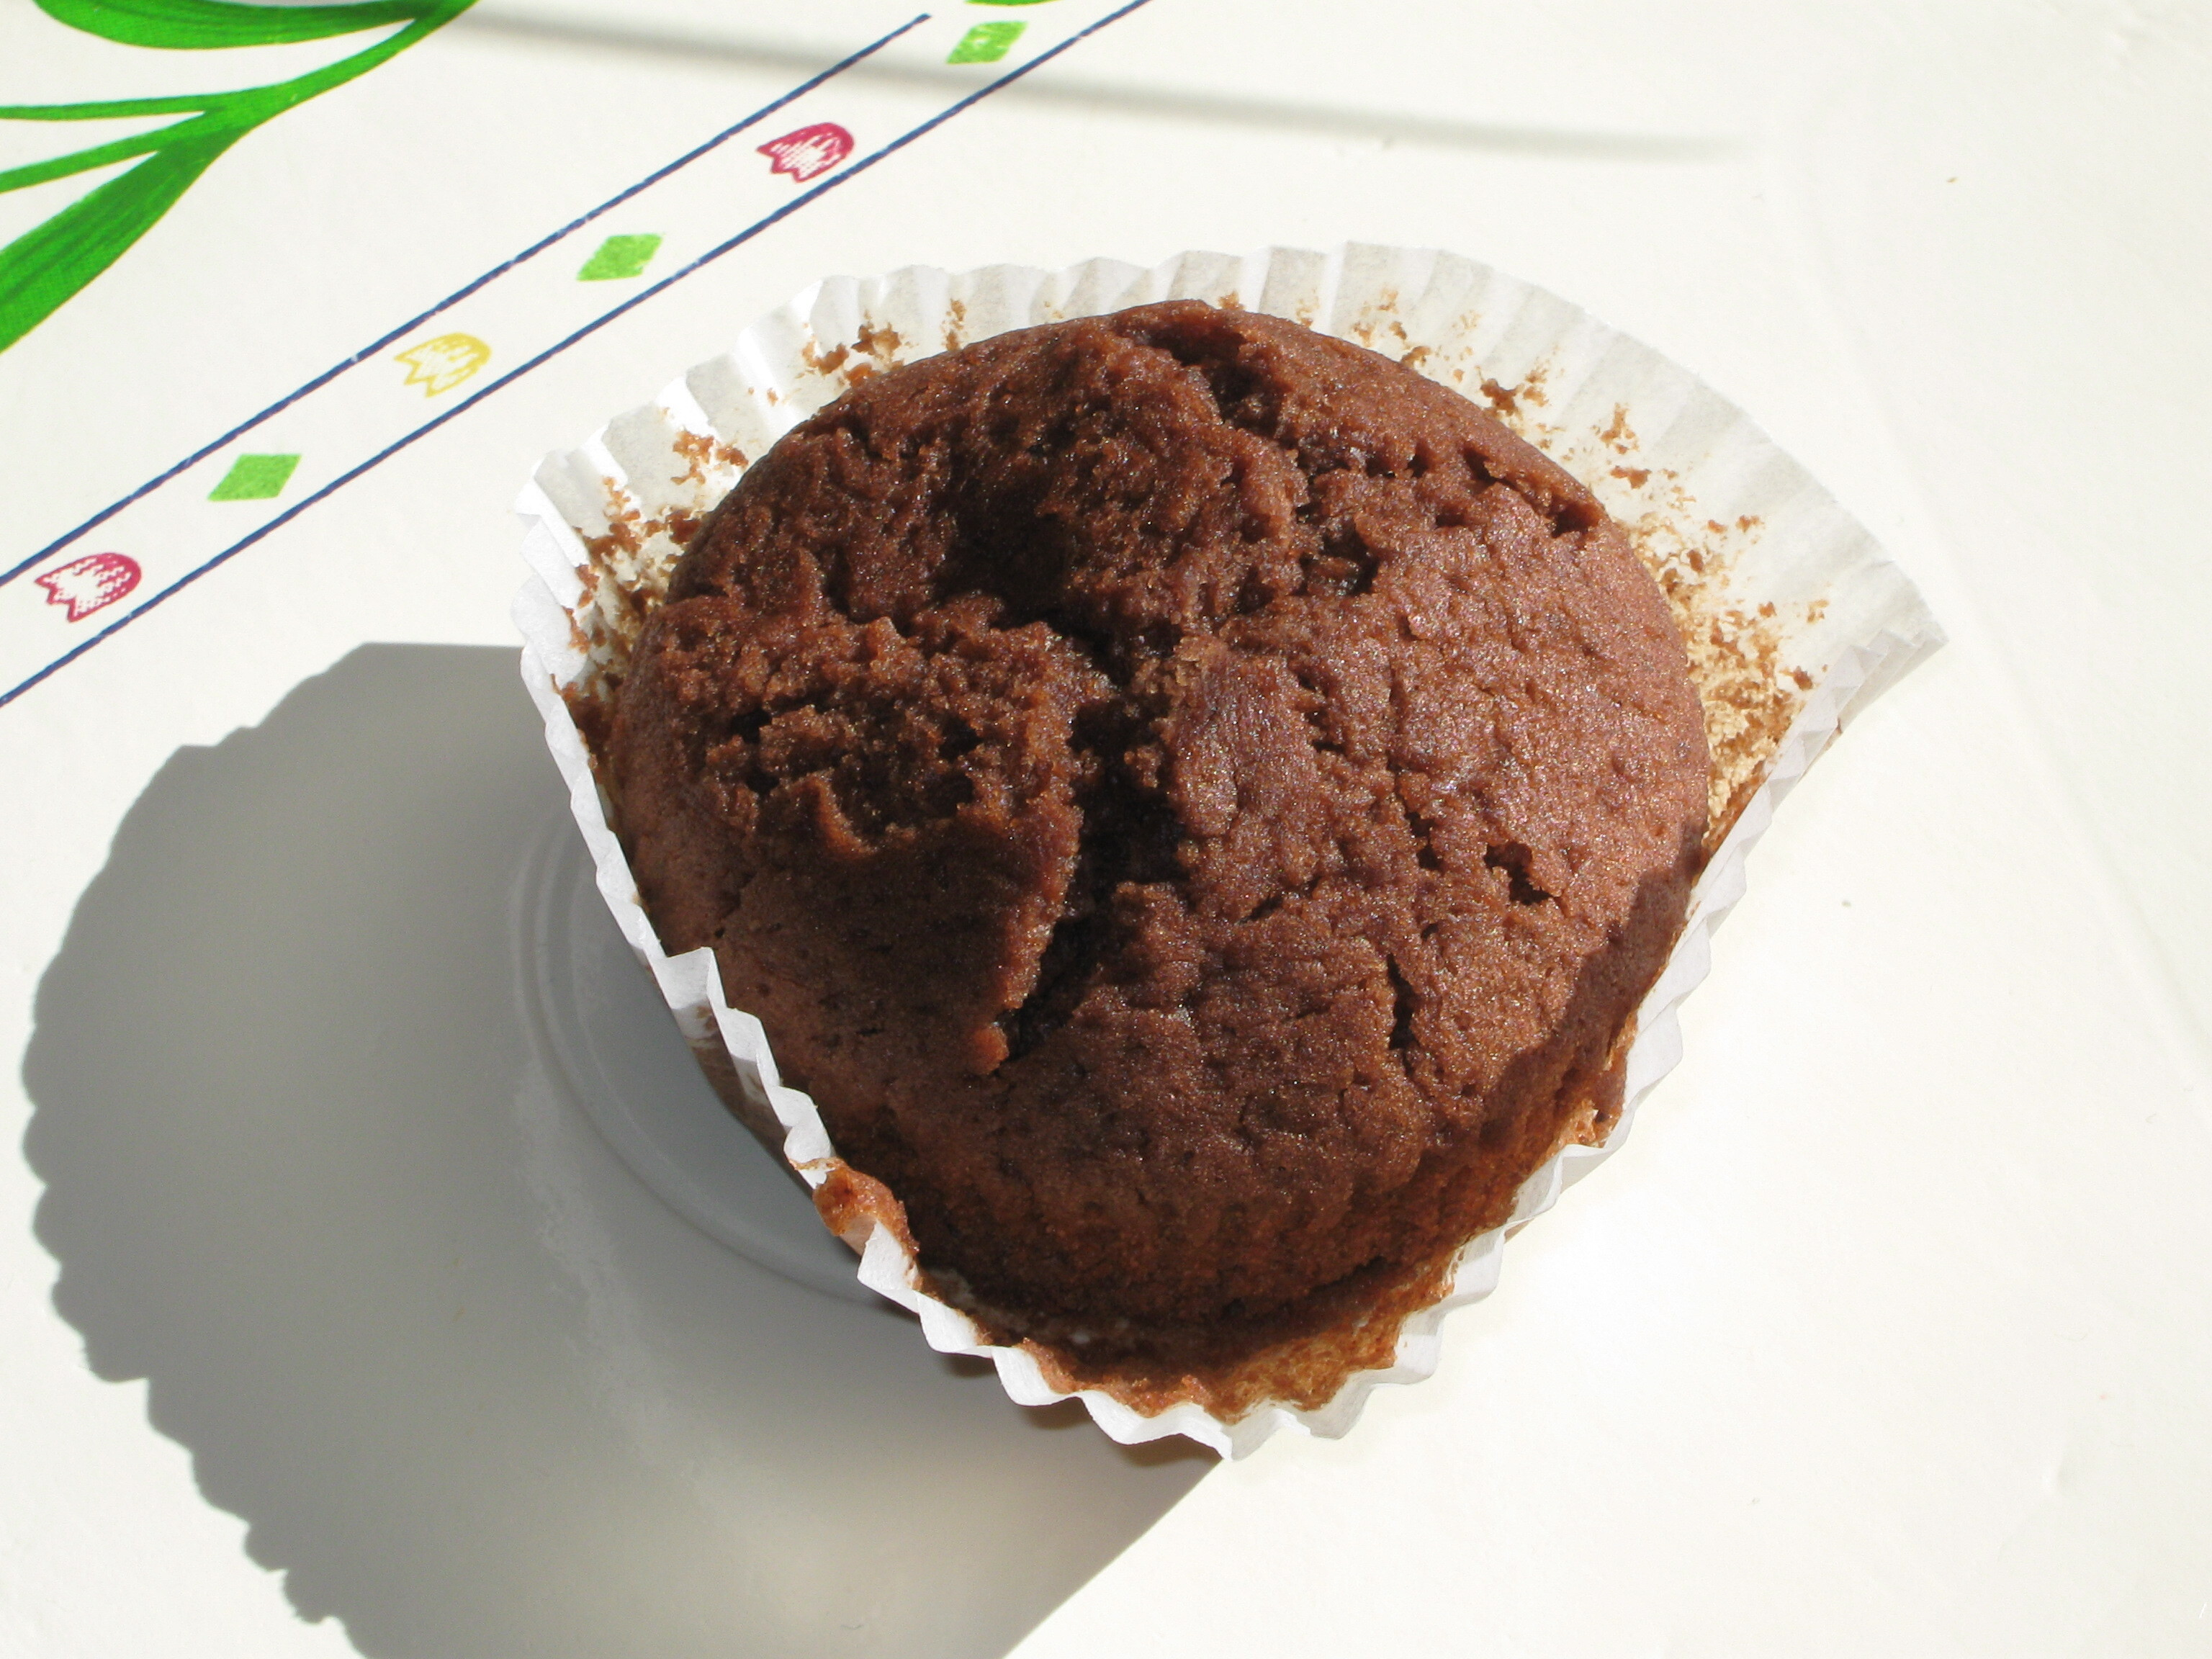 Saftiga chokladmuffins, glutenfria